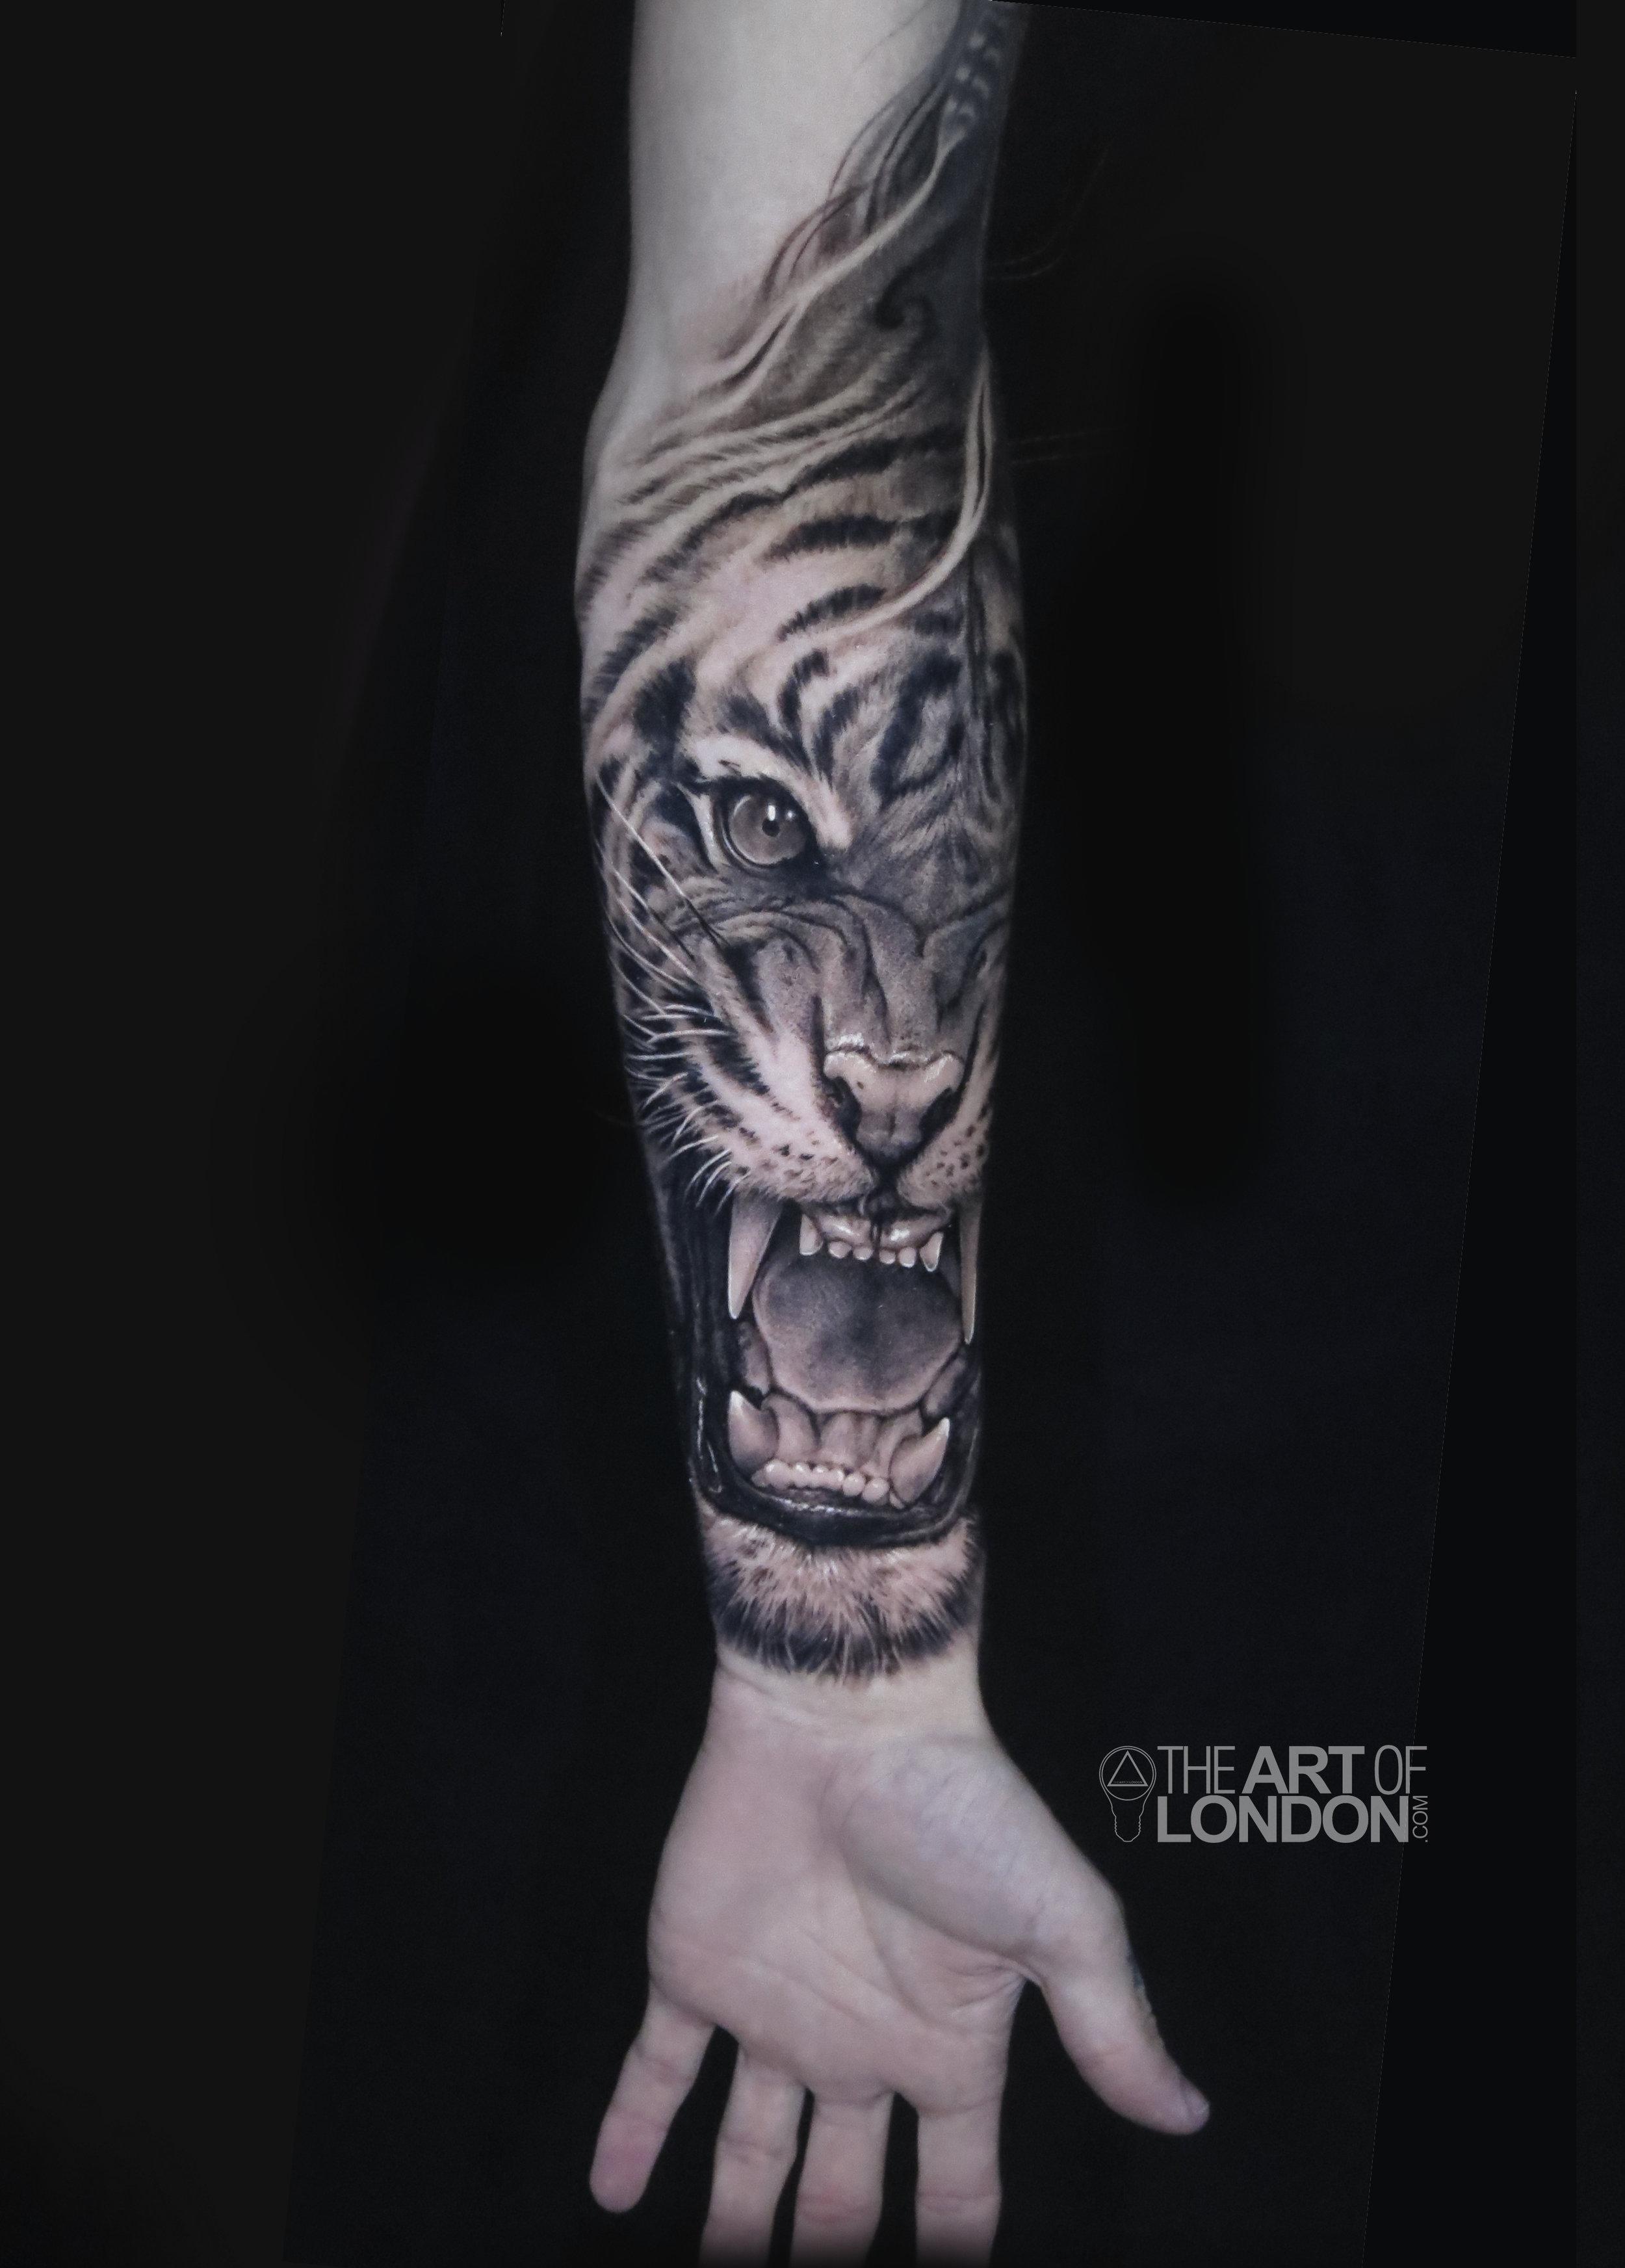 tiger portrait black and grey tattoo large.jpg